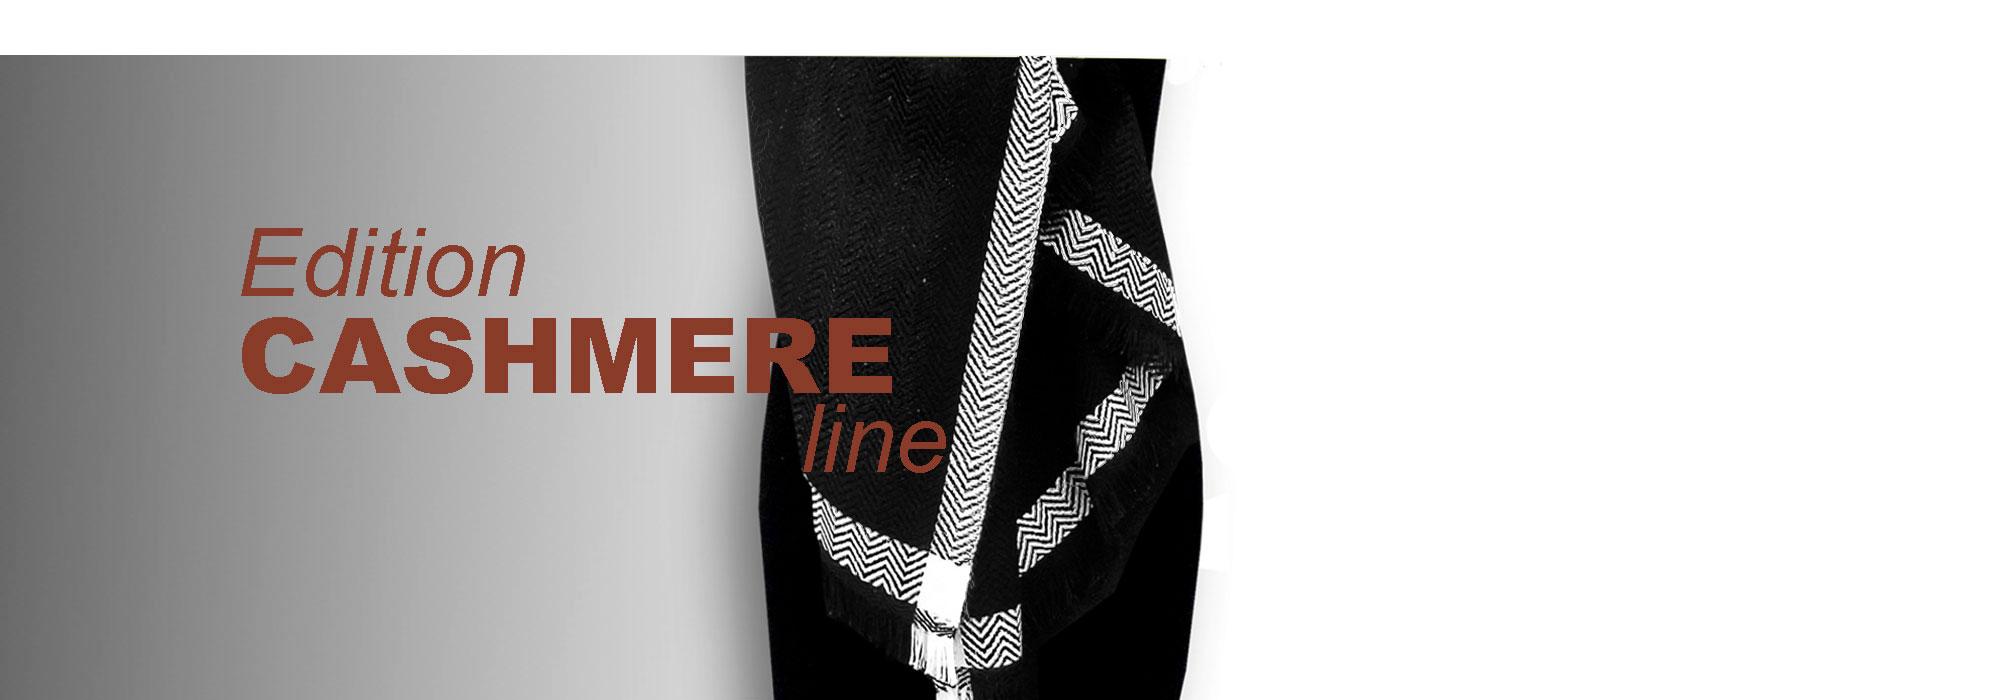 Finale-Opener-edition-cashmere-line-schal-black-white-astrid-peller-design-cashmere-line